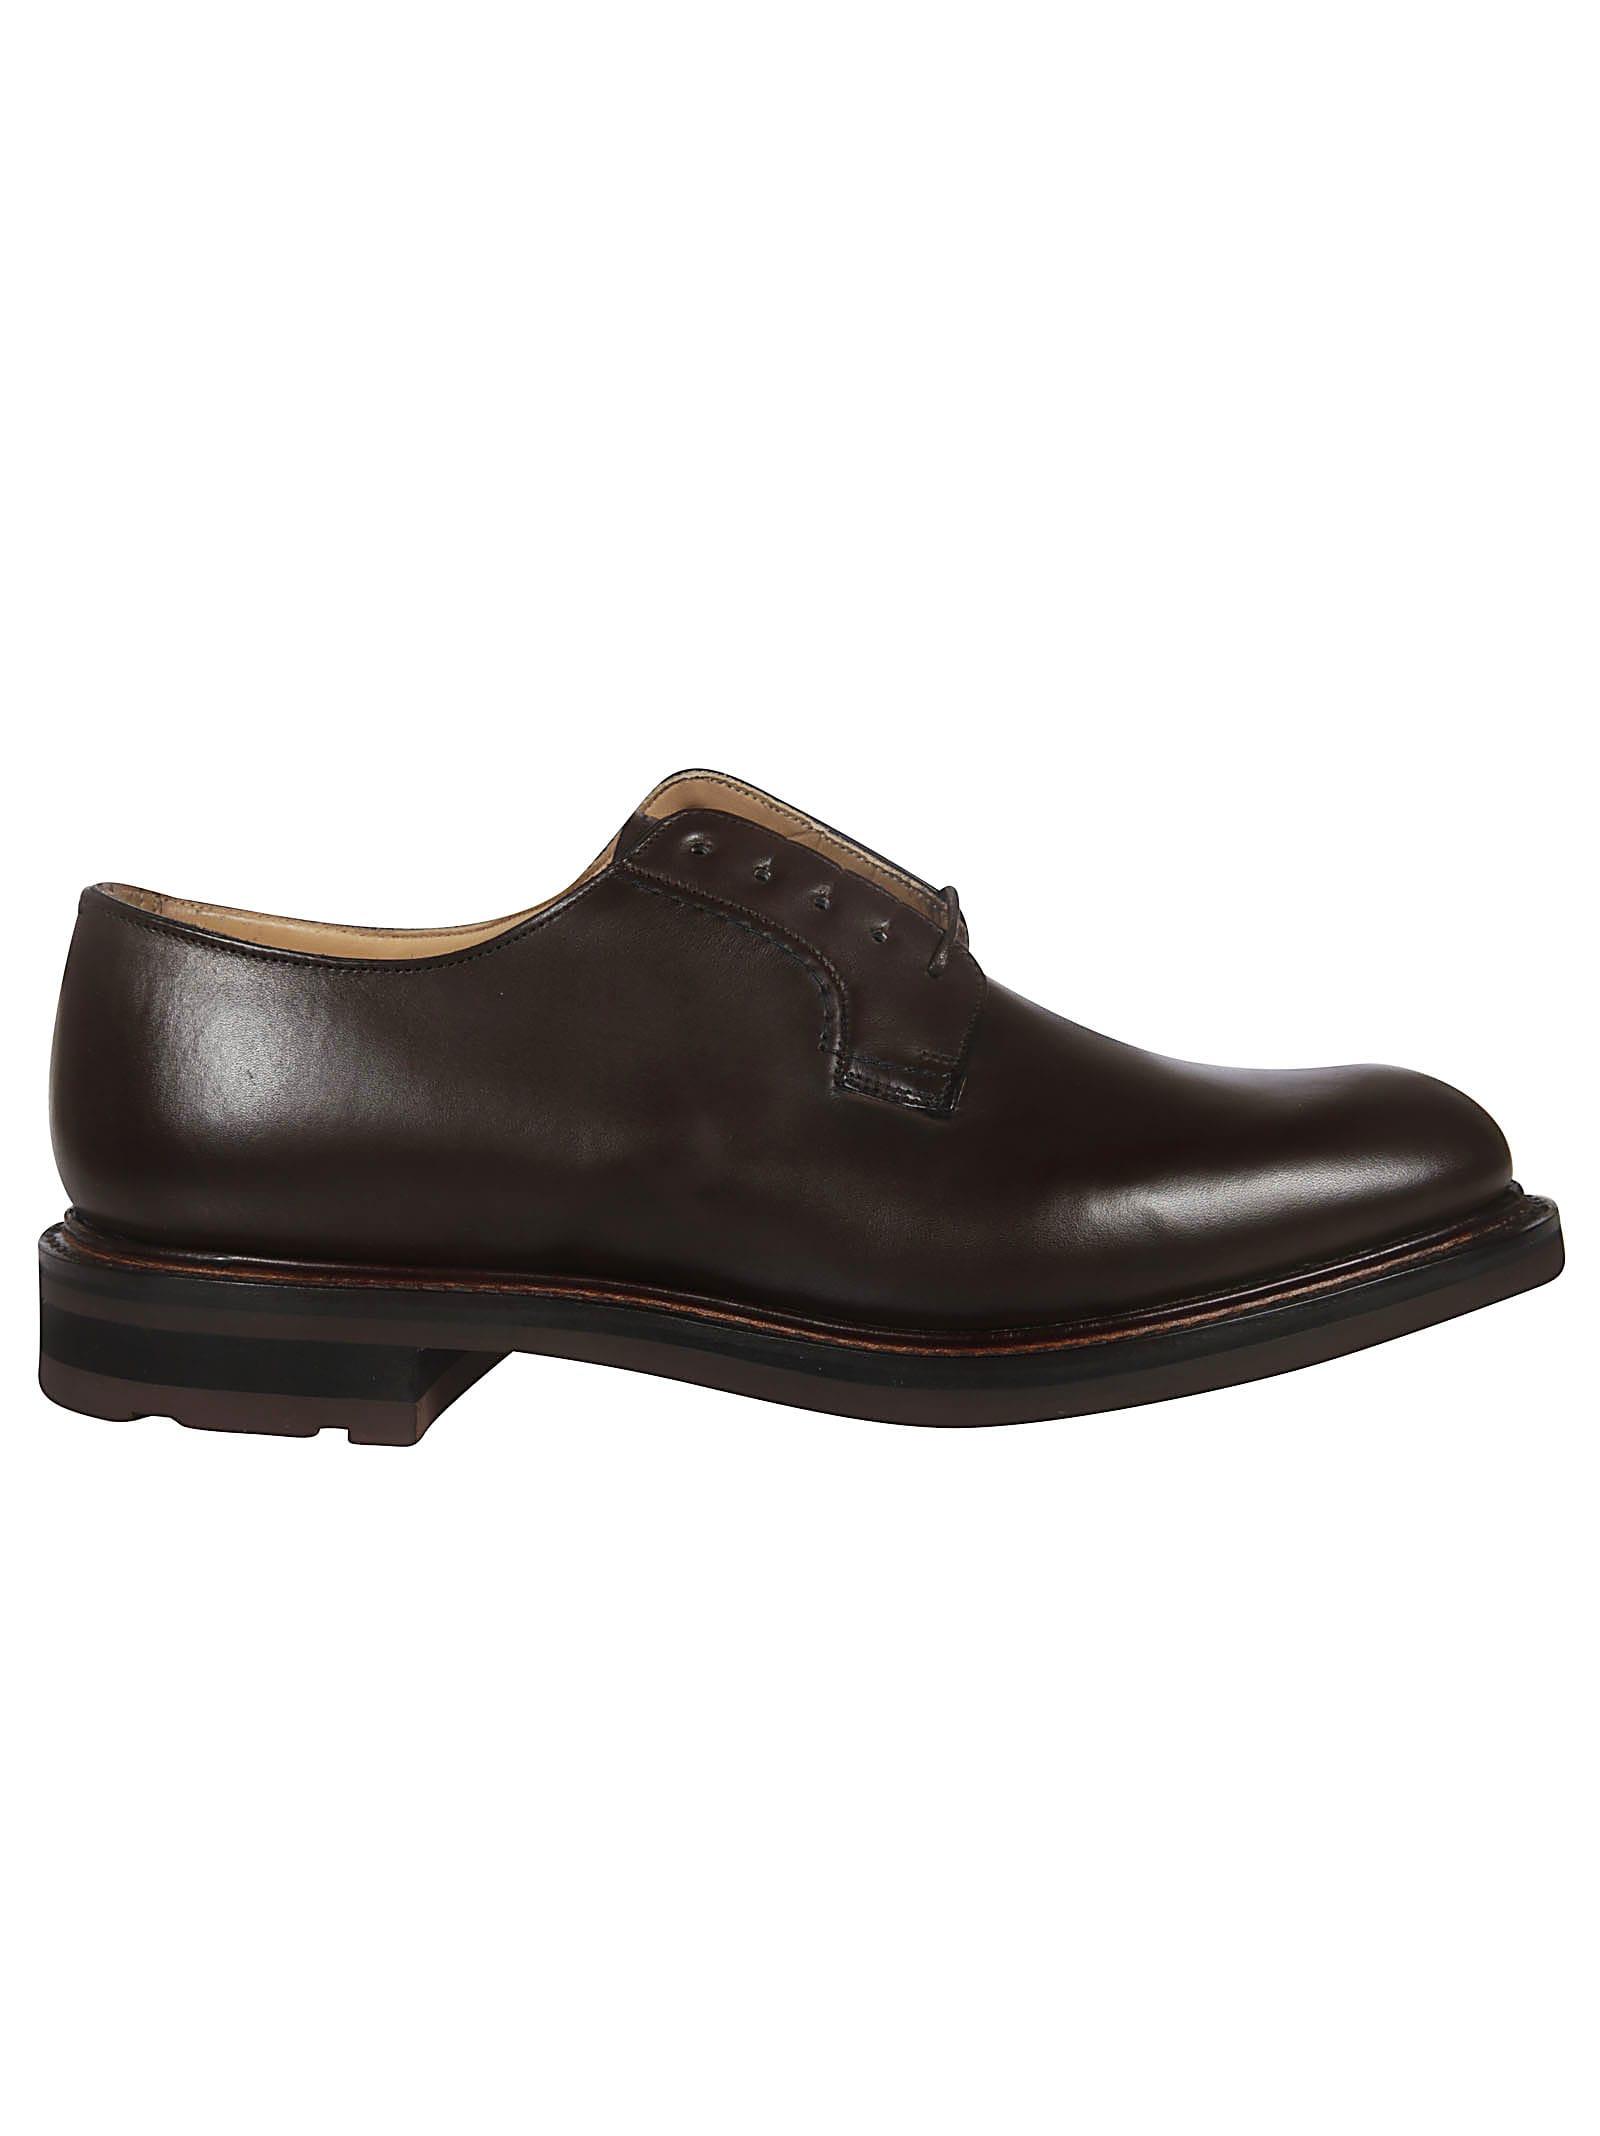 Churchs Woodbridge Derby Shoes